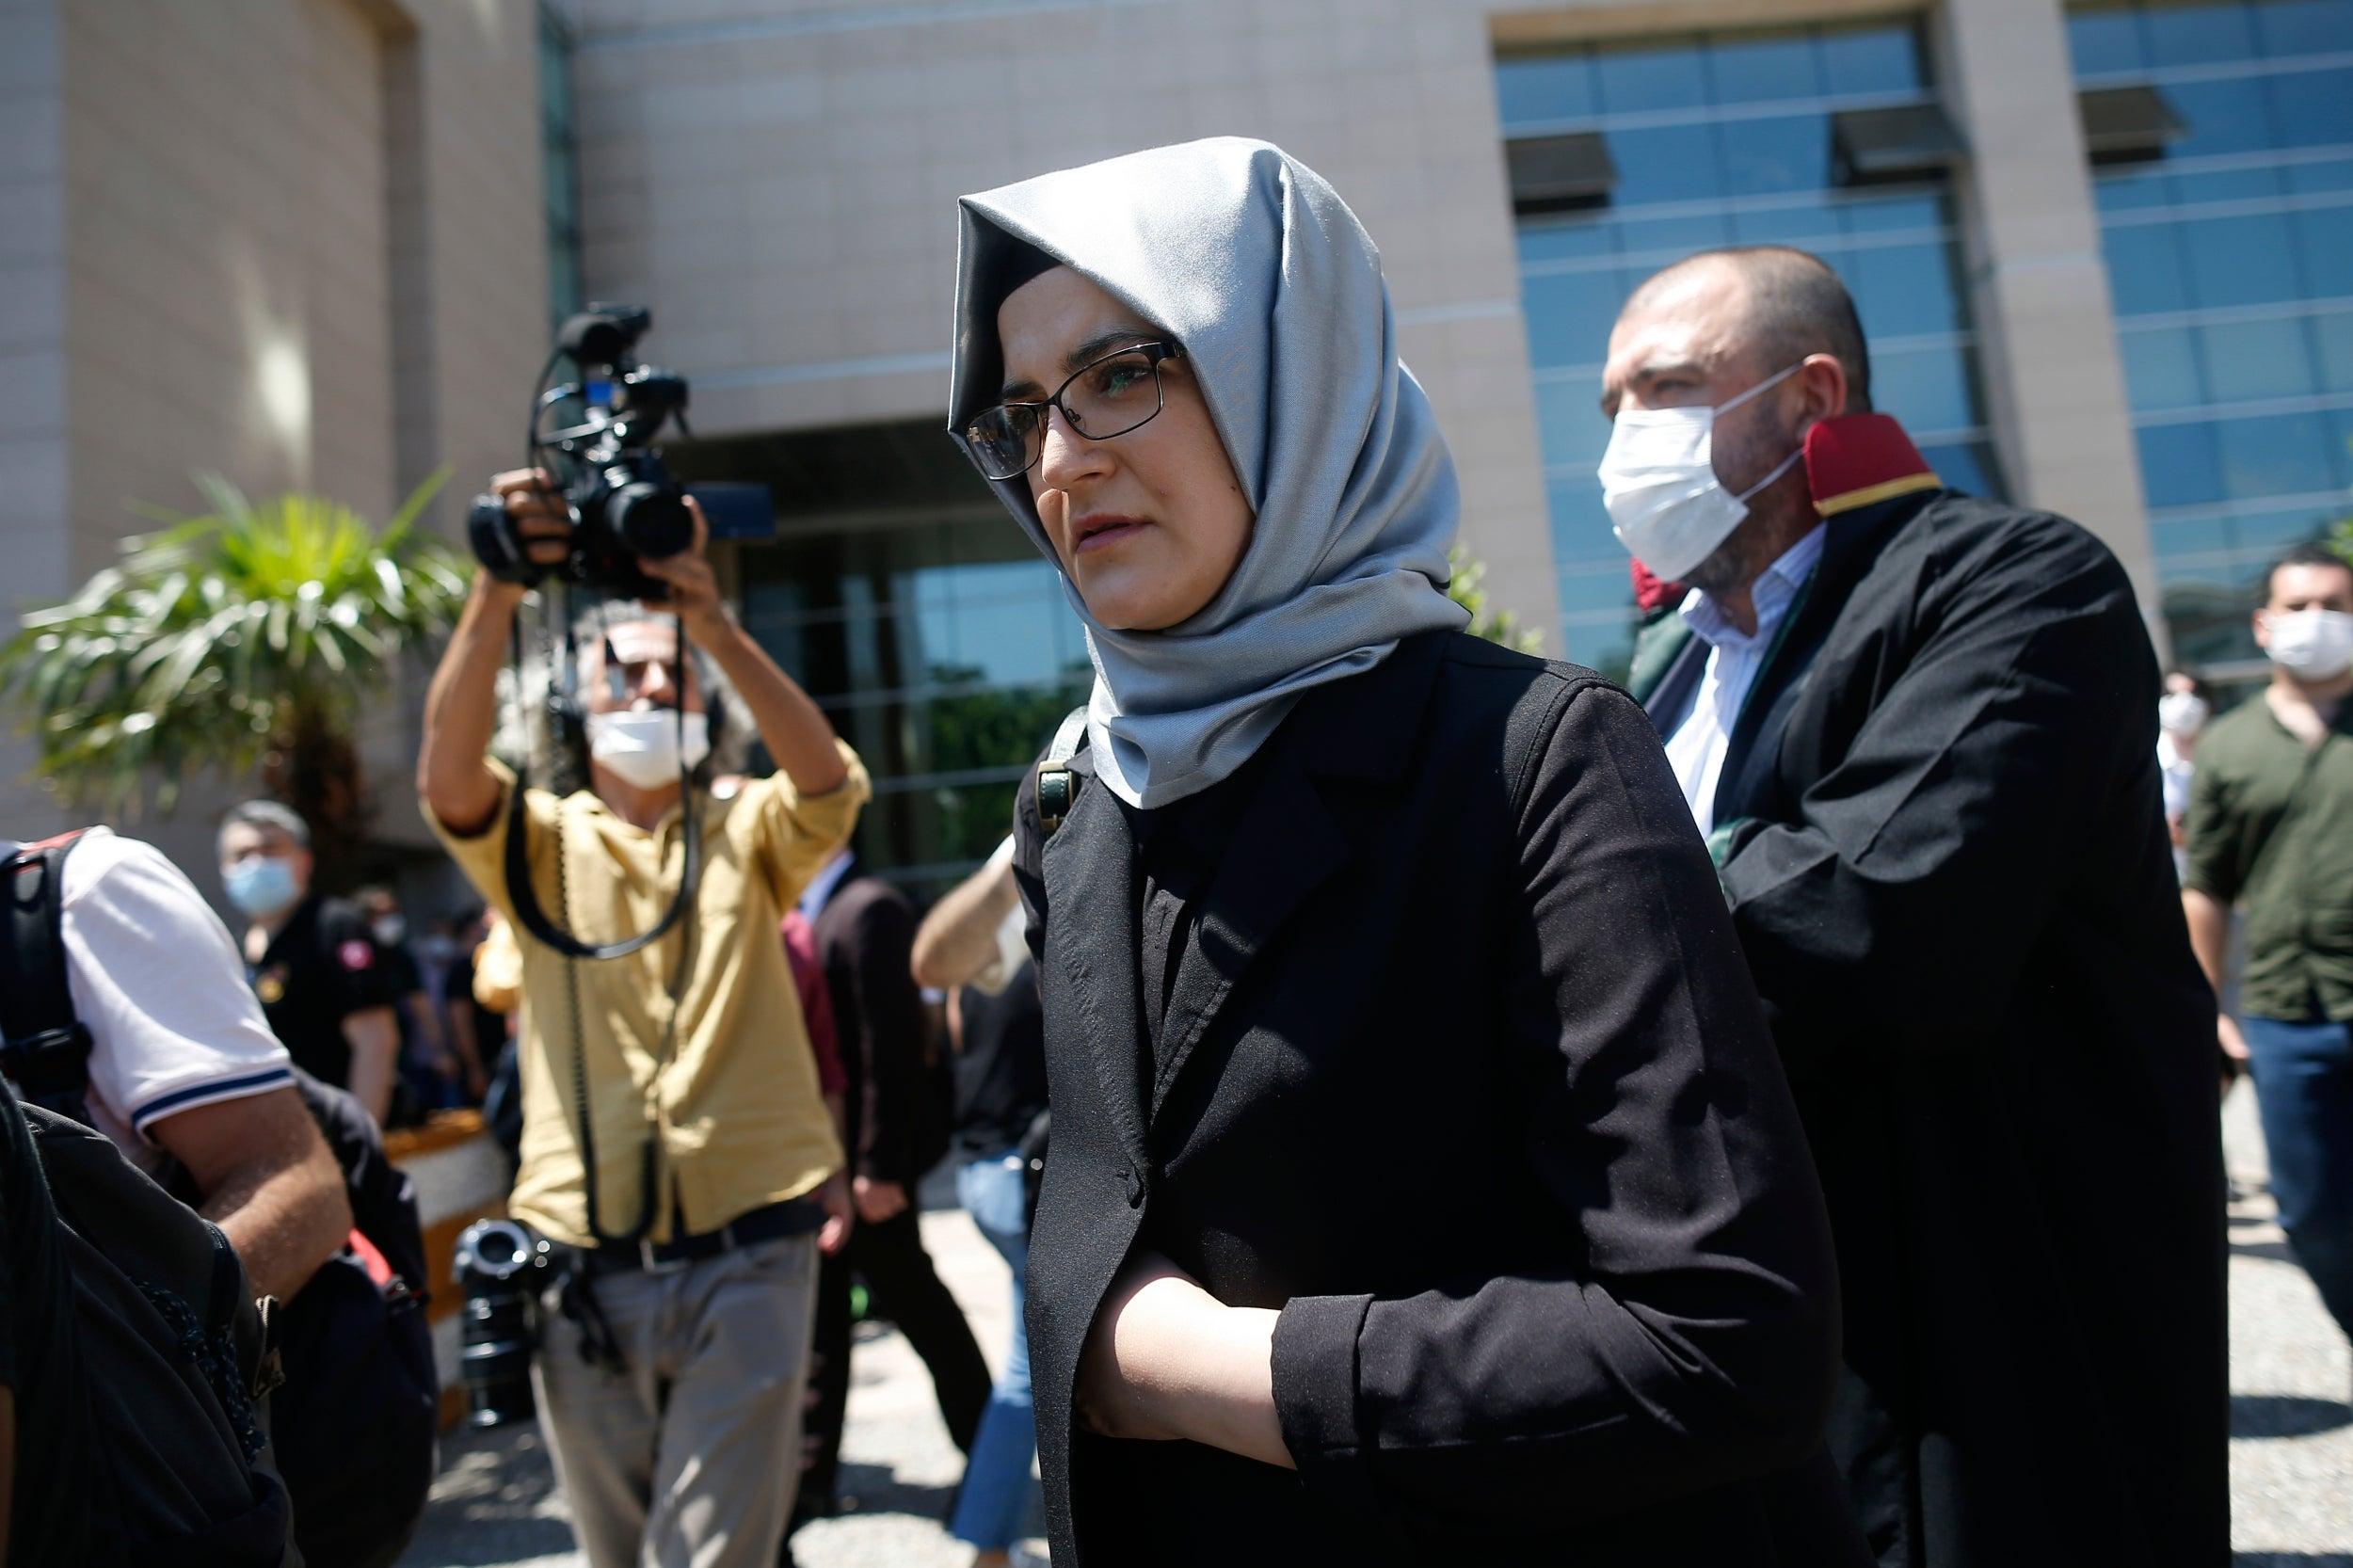 New details surrounding Khashoggi's death emerge as Turkey begins trial without Saudi suspects